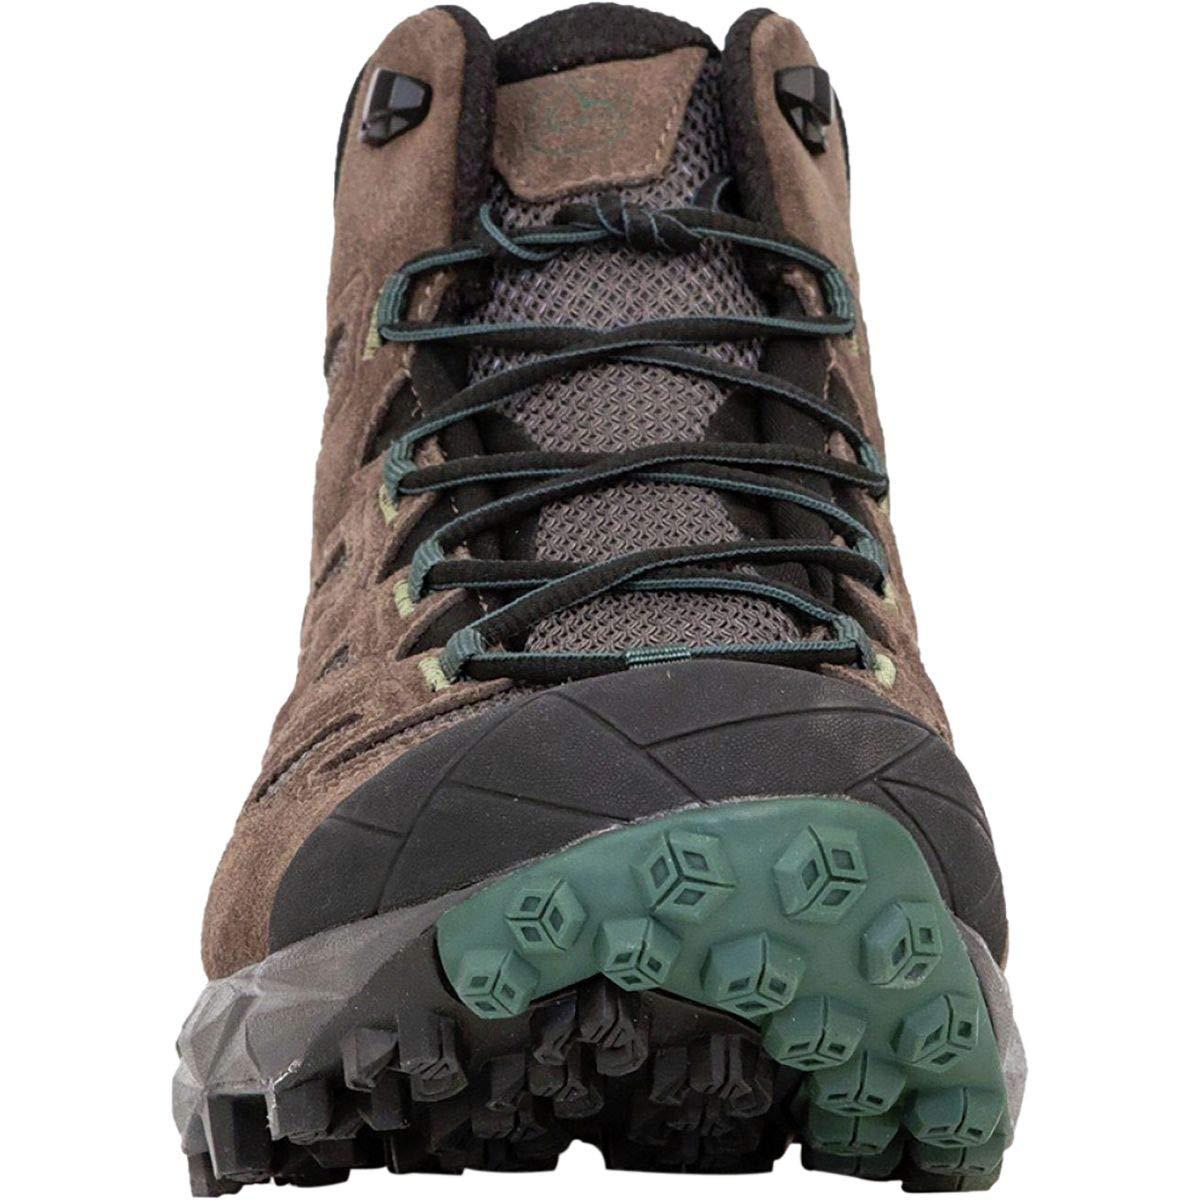 La Sportiva Trail Ridge MID Hiking Shoe